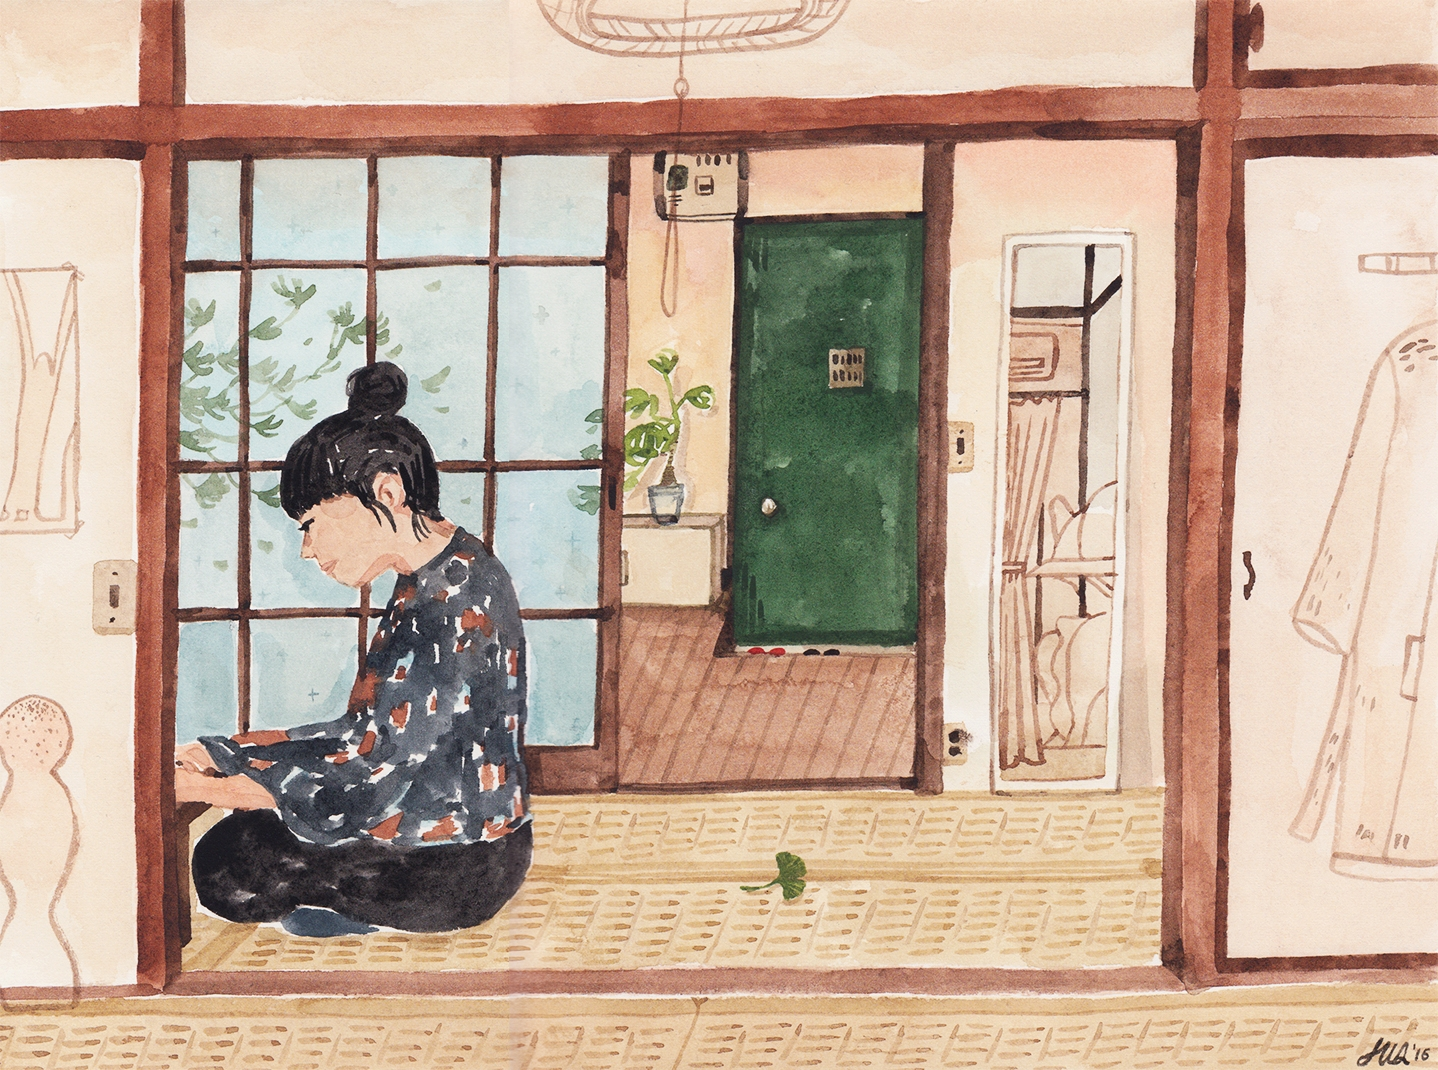 Justine-Wong-Illustration-Japan-Tokyo-Home-Interior-LoRes.jpg